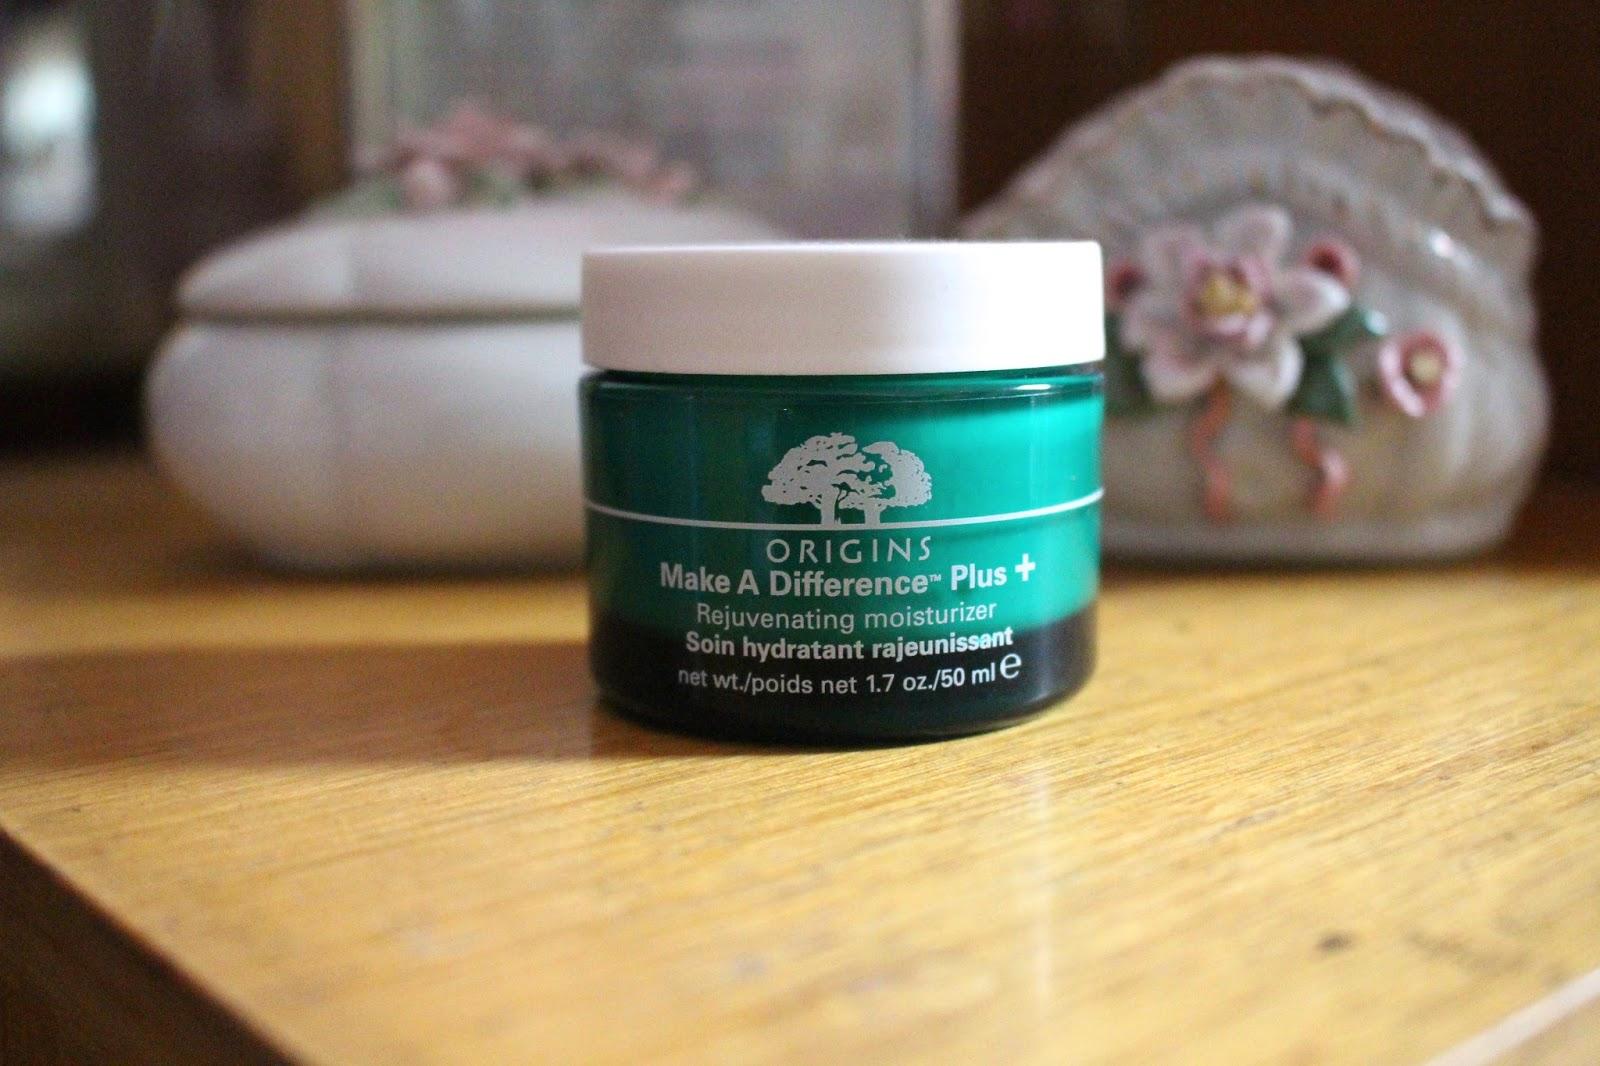 Origins Make a difference moisturiser